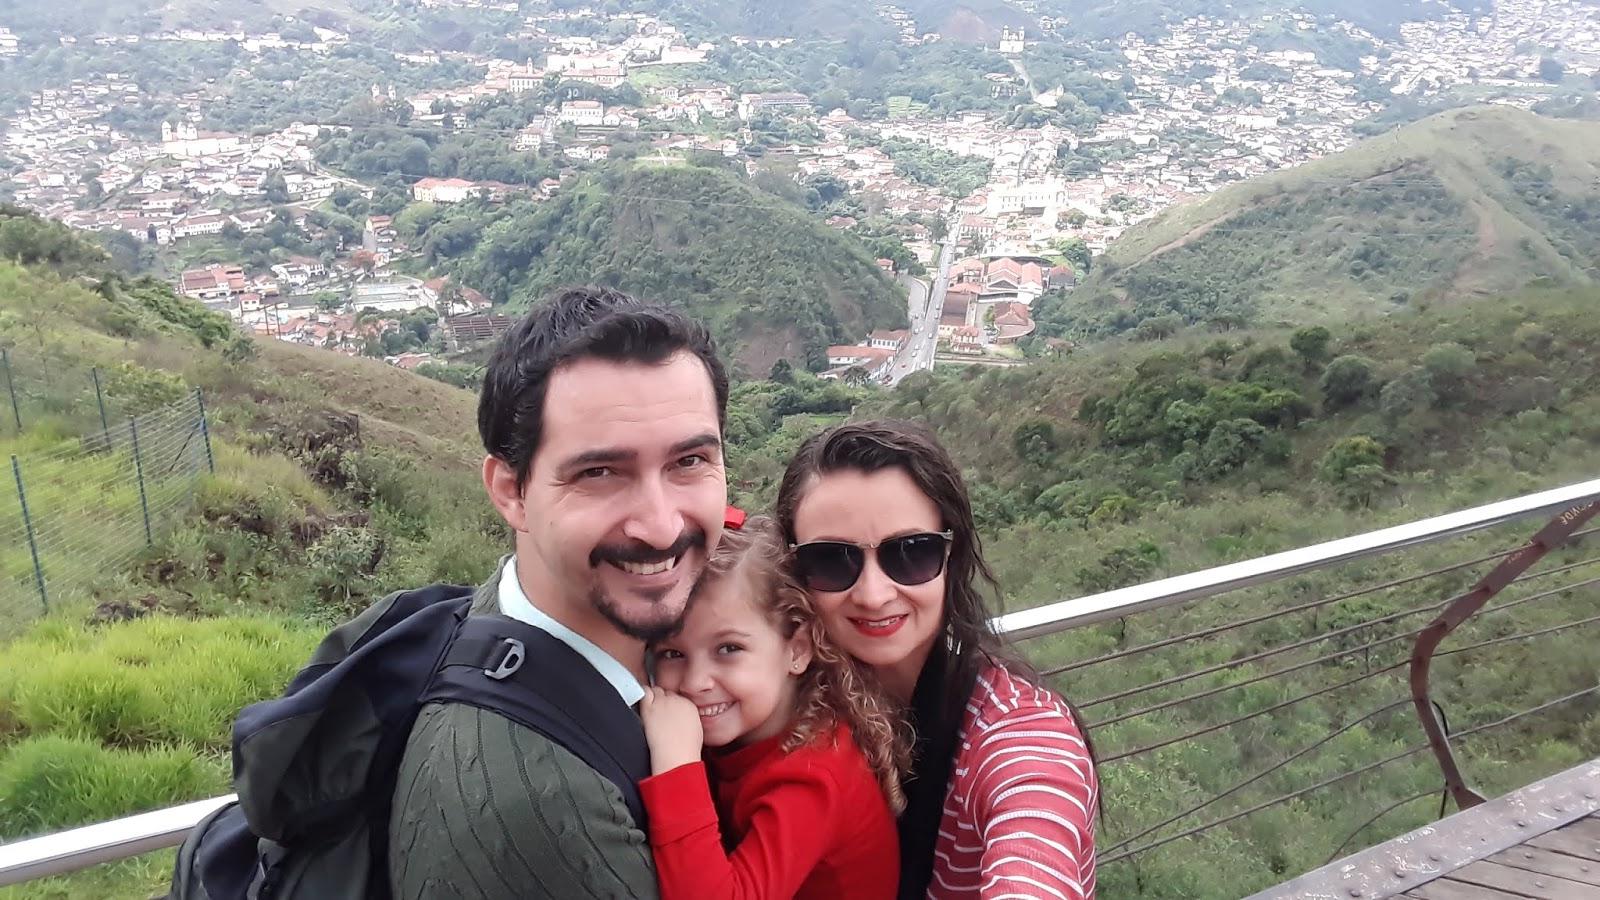 Vista para a cidade de Ouro Preto a partir do Mirante da UFOP